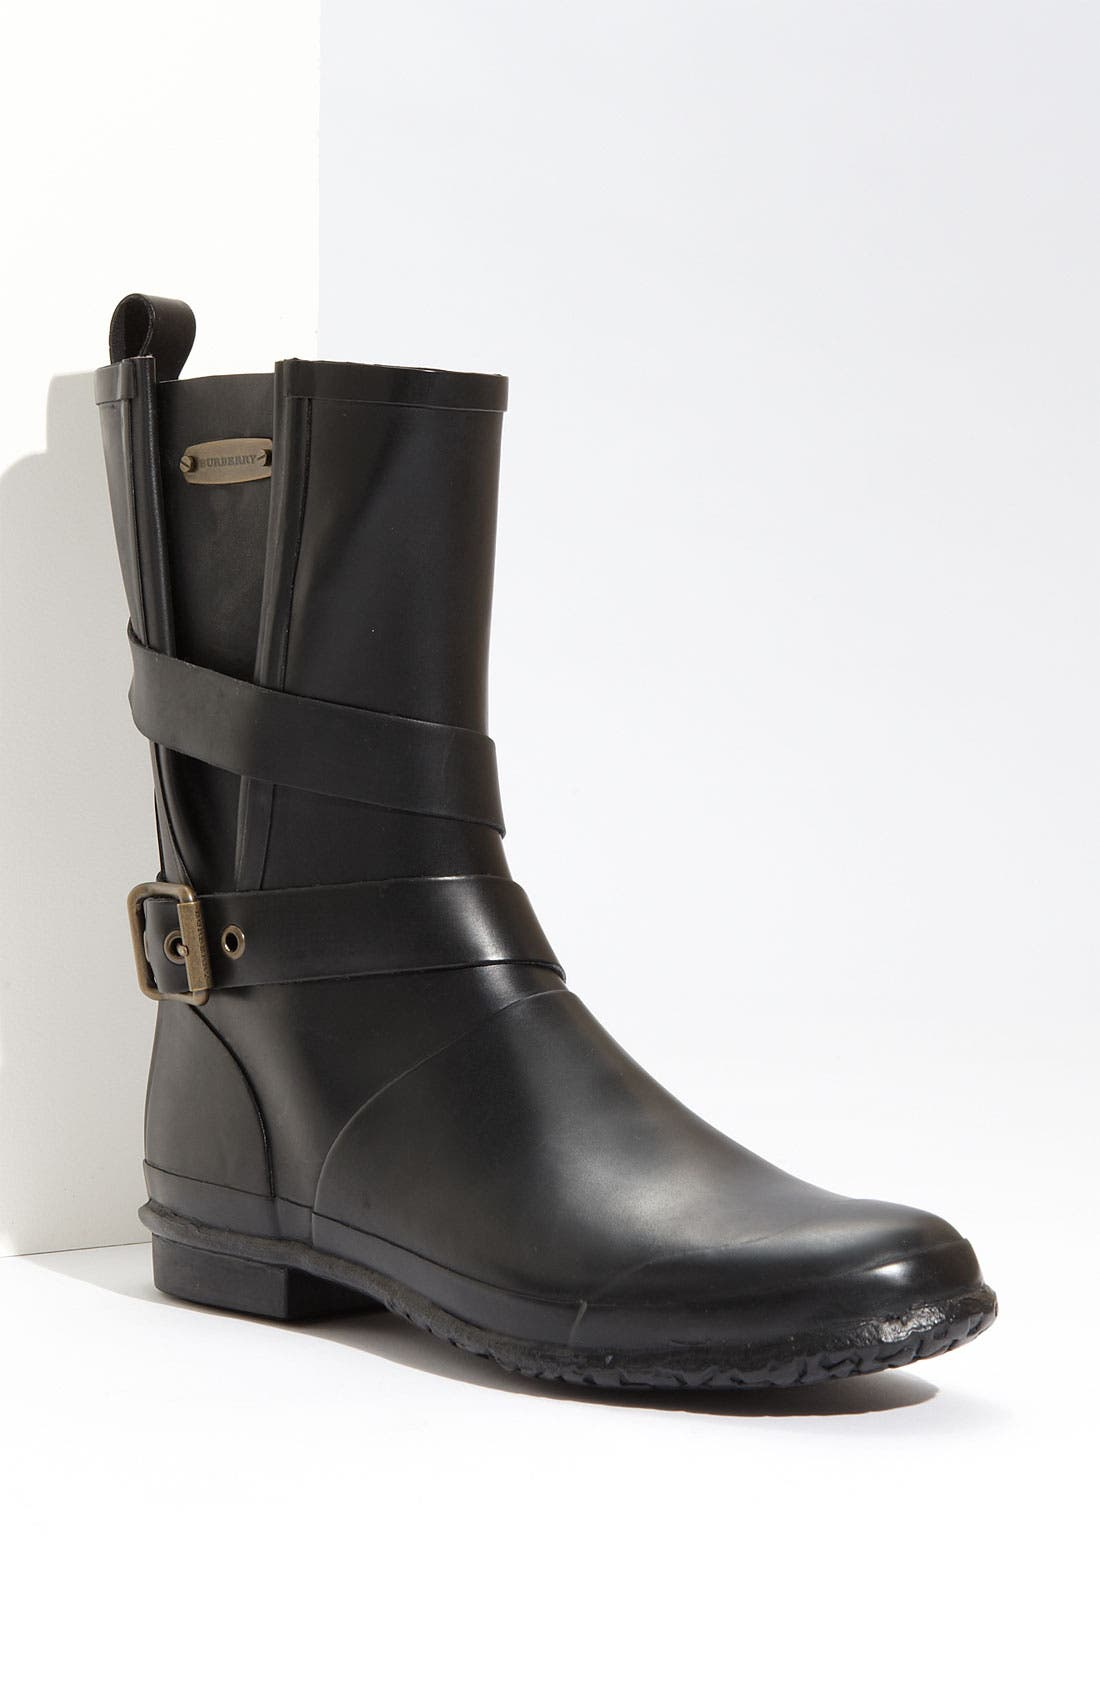 Main Image - Burberry Buckled Rain Boot (Women)